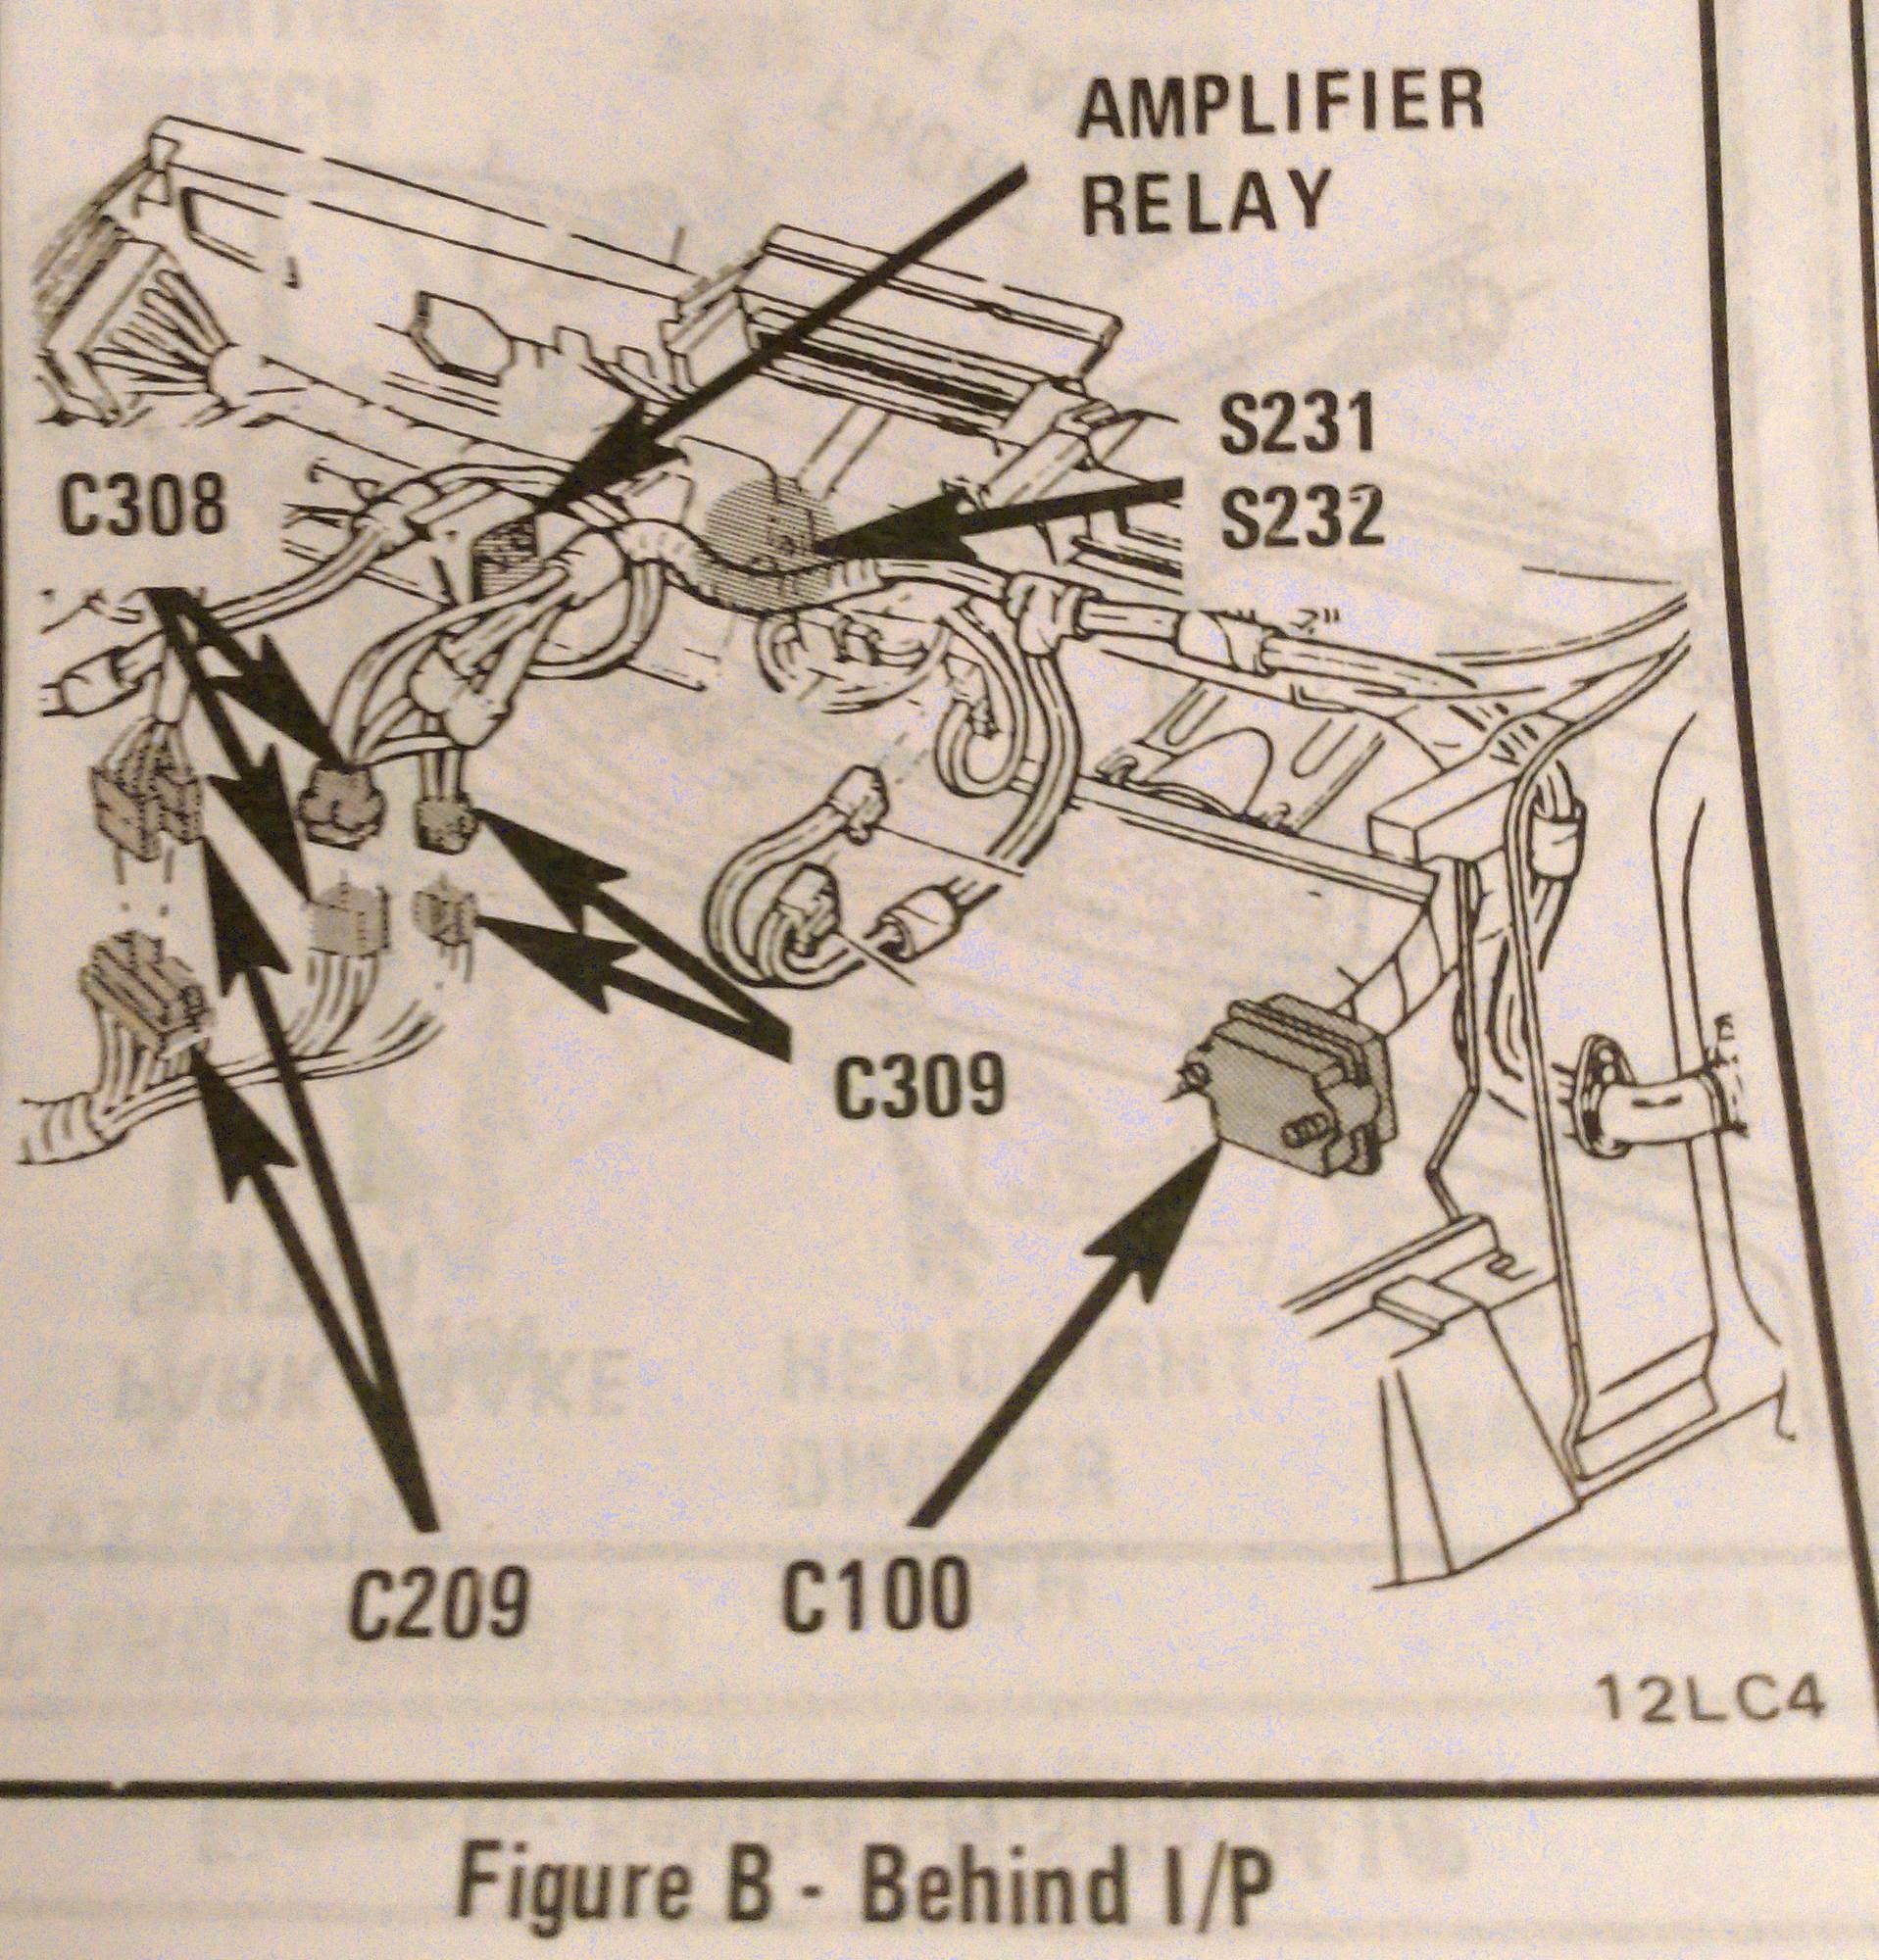 1986 Corvette Bose Radio Wiring Diagram Trusted Gm Amp Powers On But No Sound Corvetteforum Chevrolet